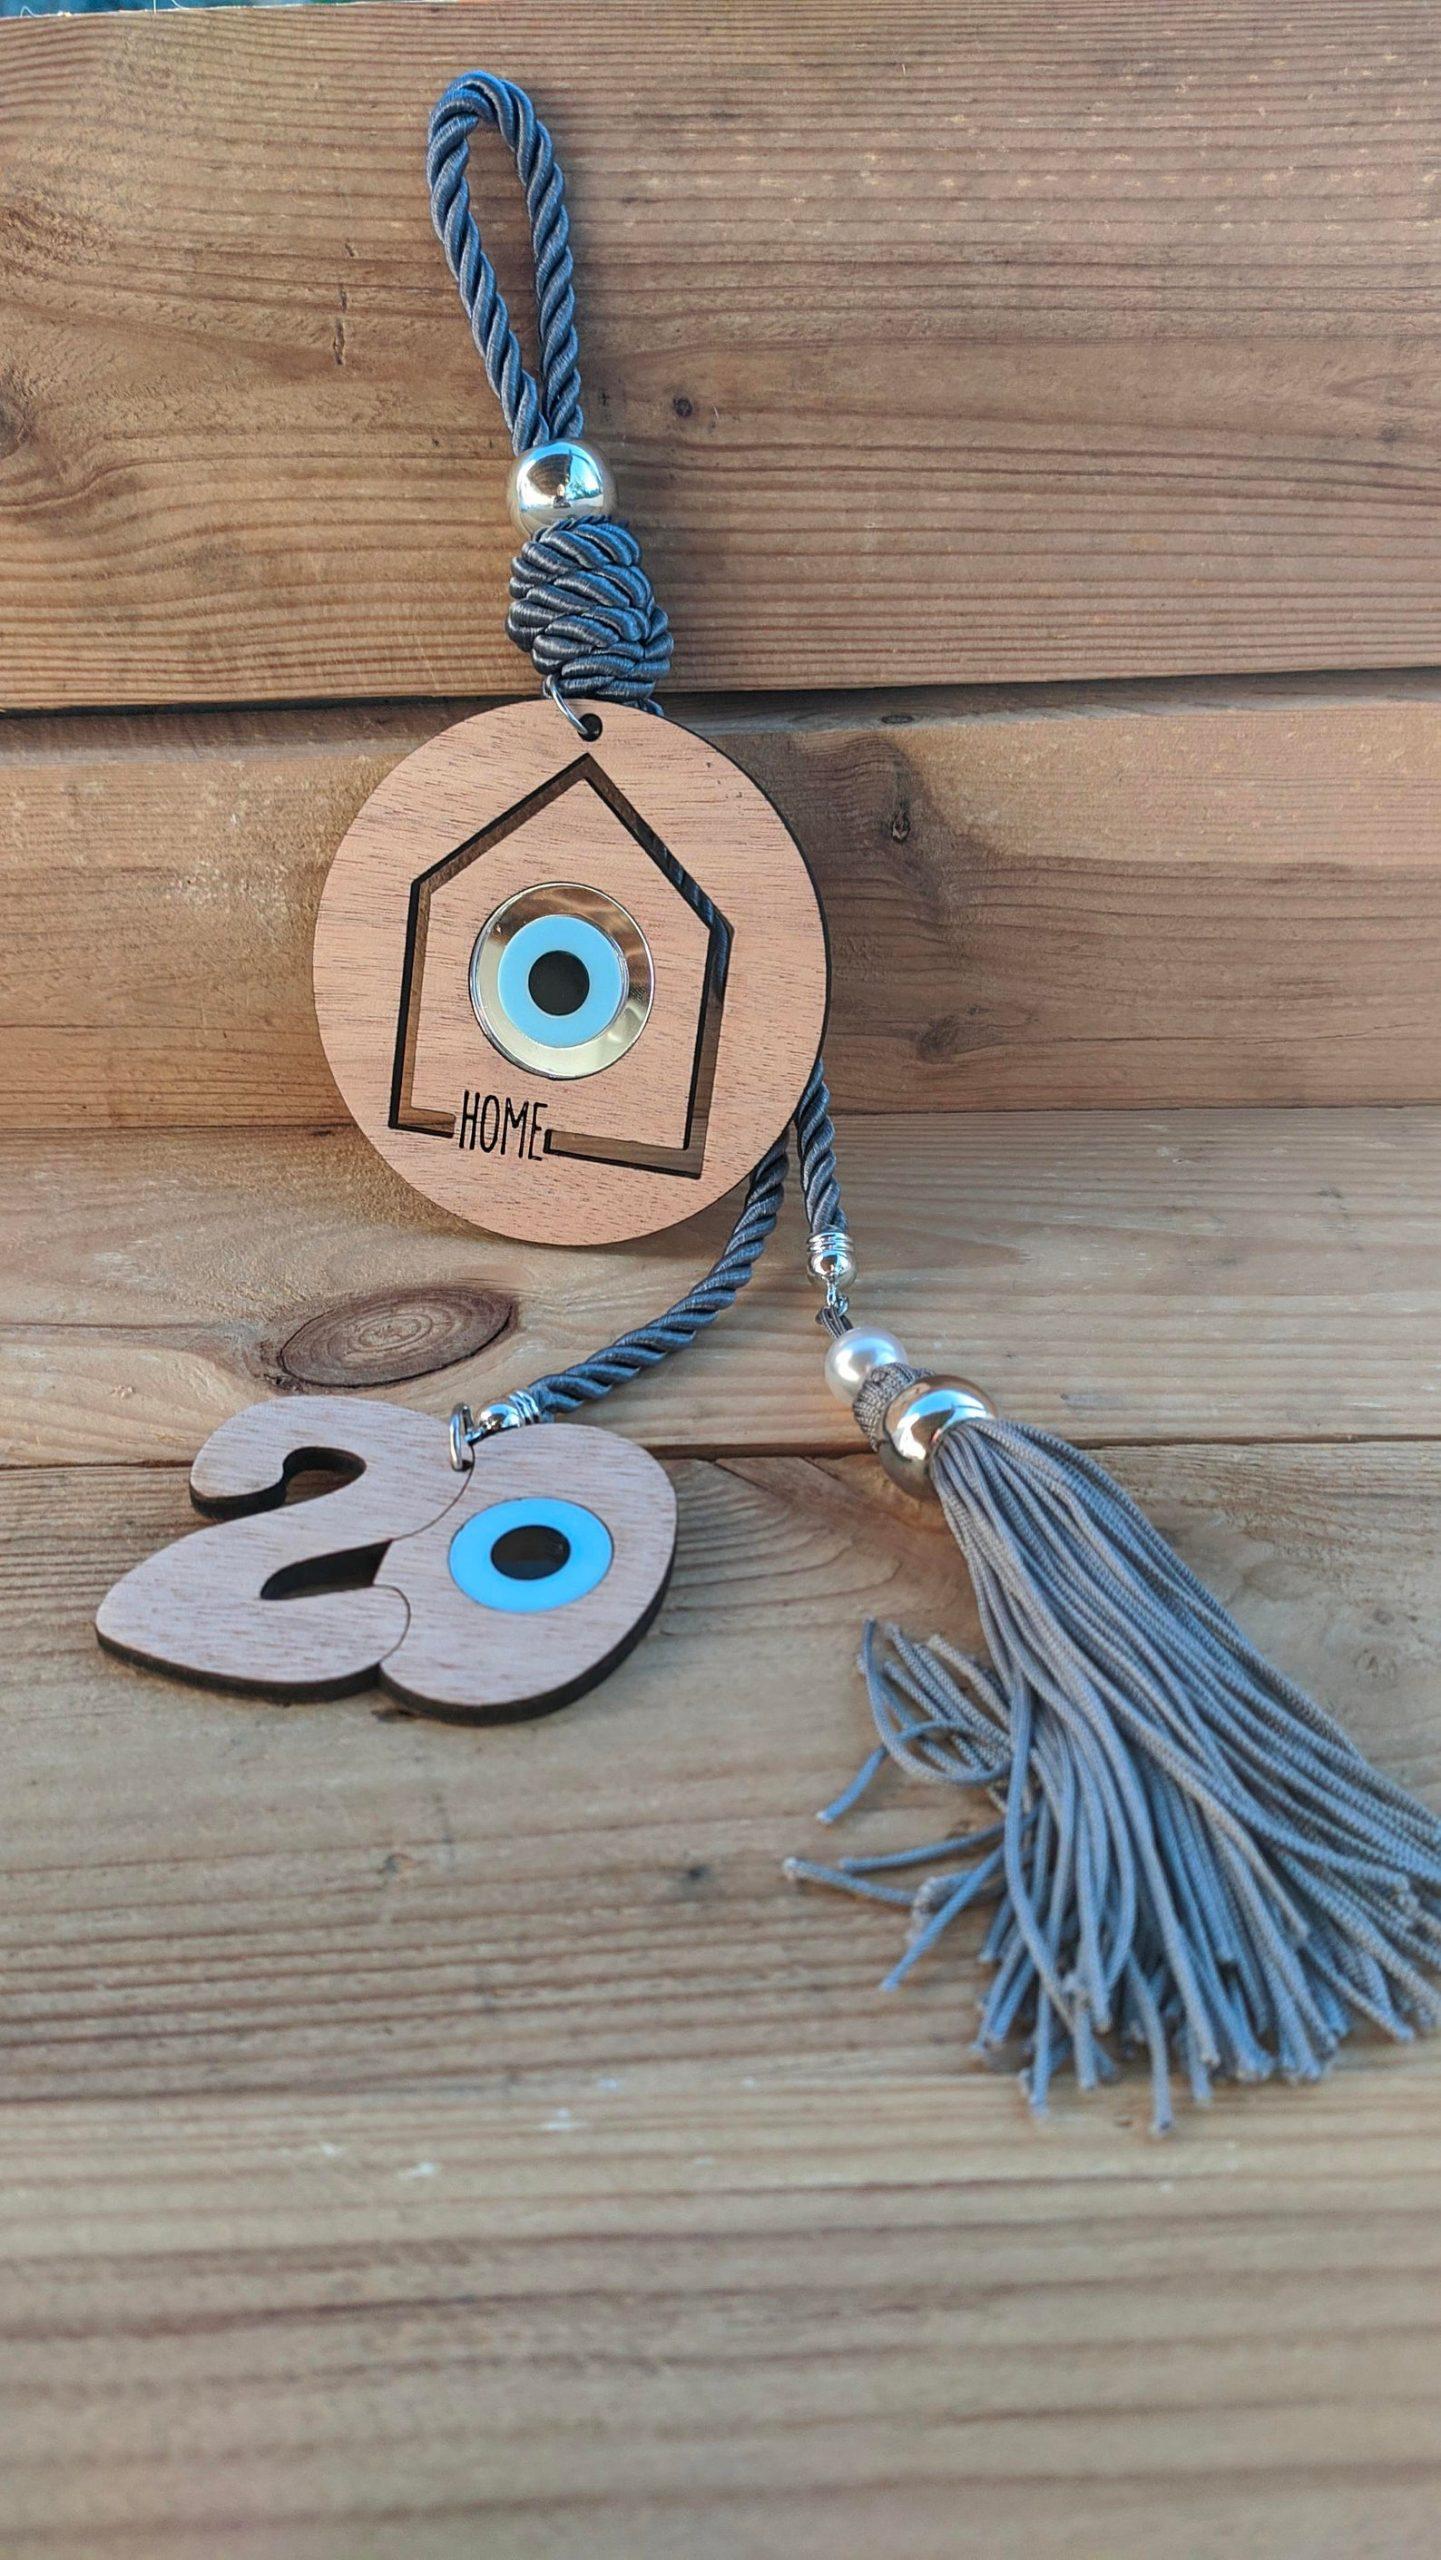 house evil eye ornament